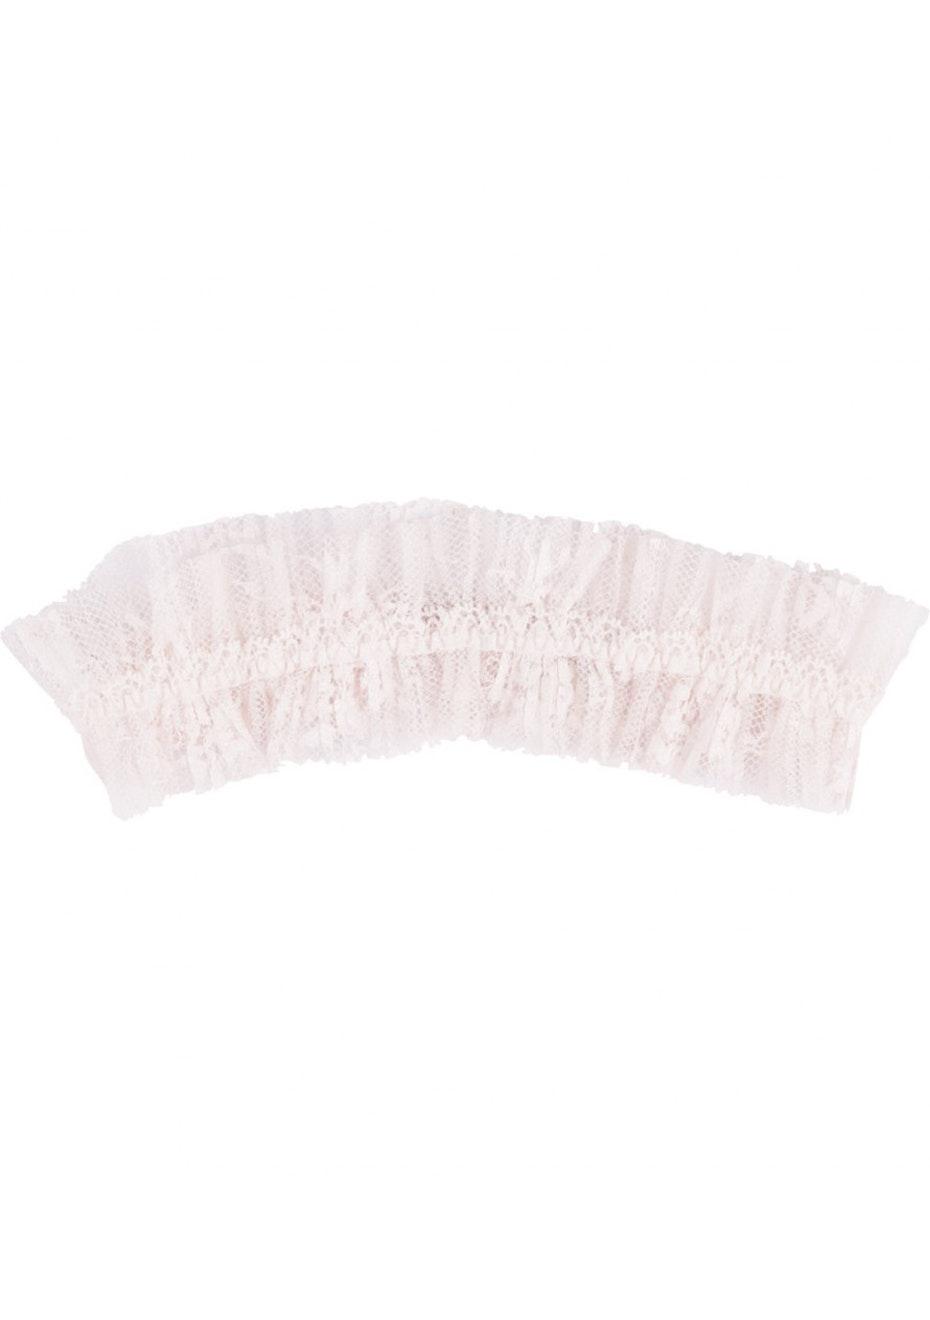 Stella McCartney - Kate Kissing Garter - Floral White